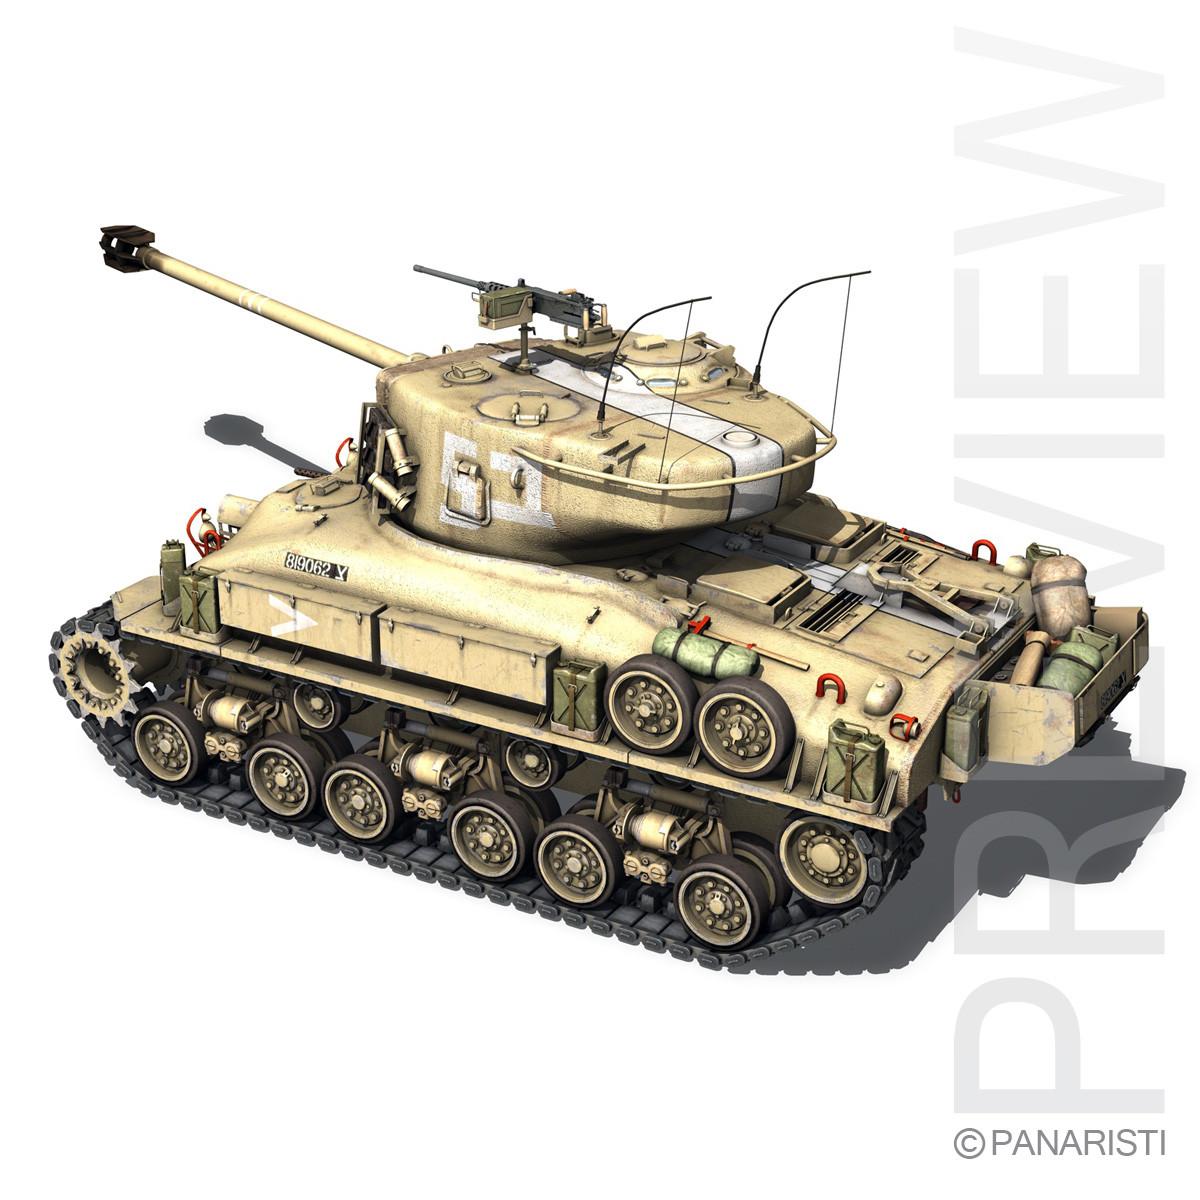 M-51 Isherman